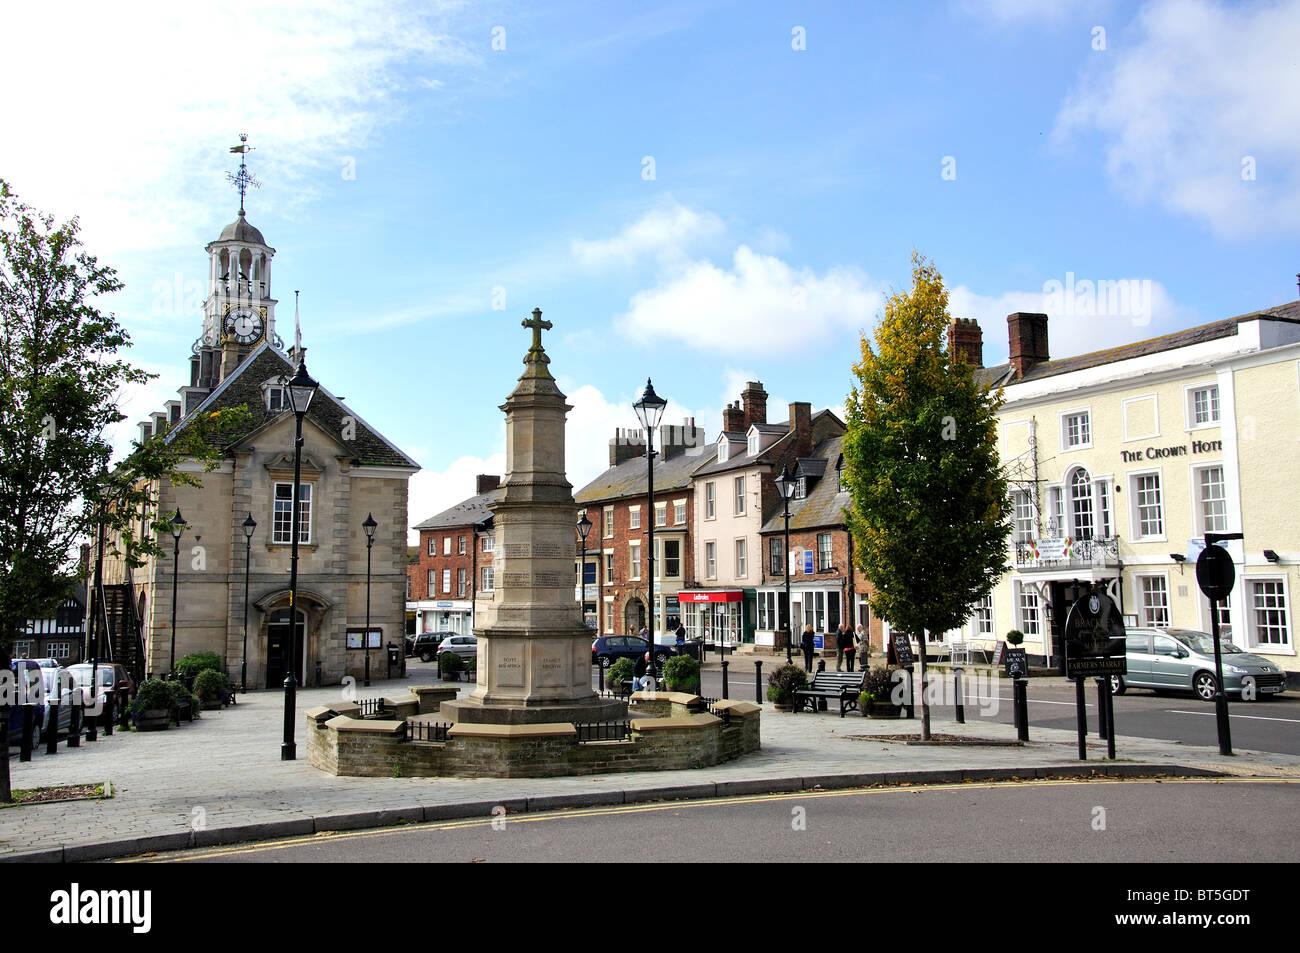 Brackley northamptonshire united kingdom